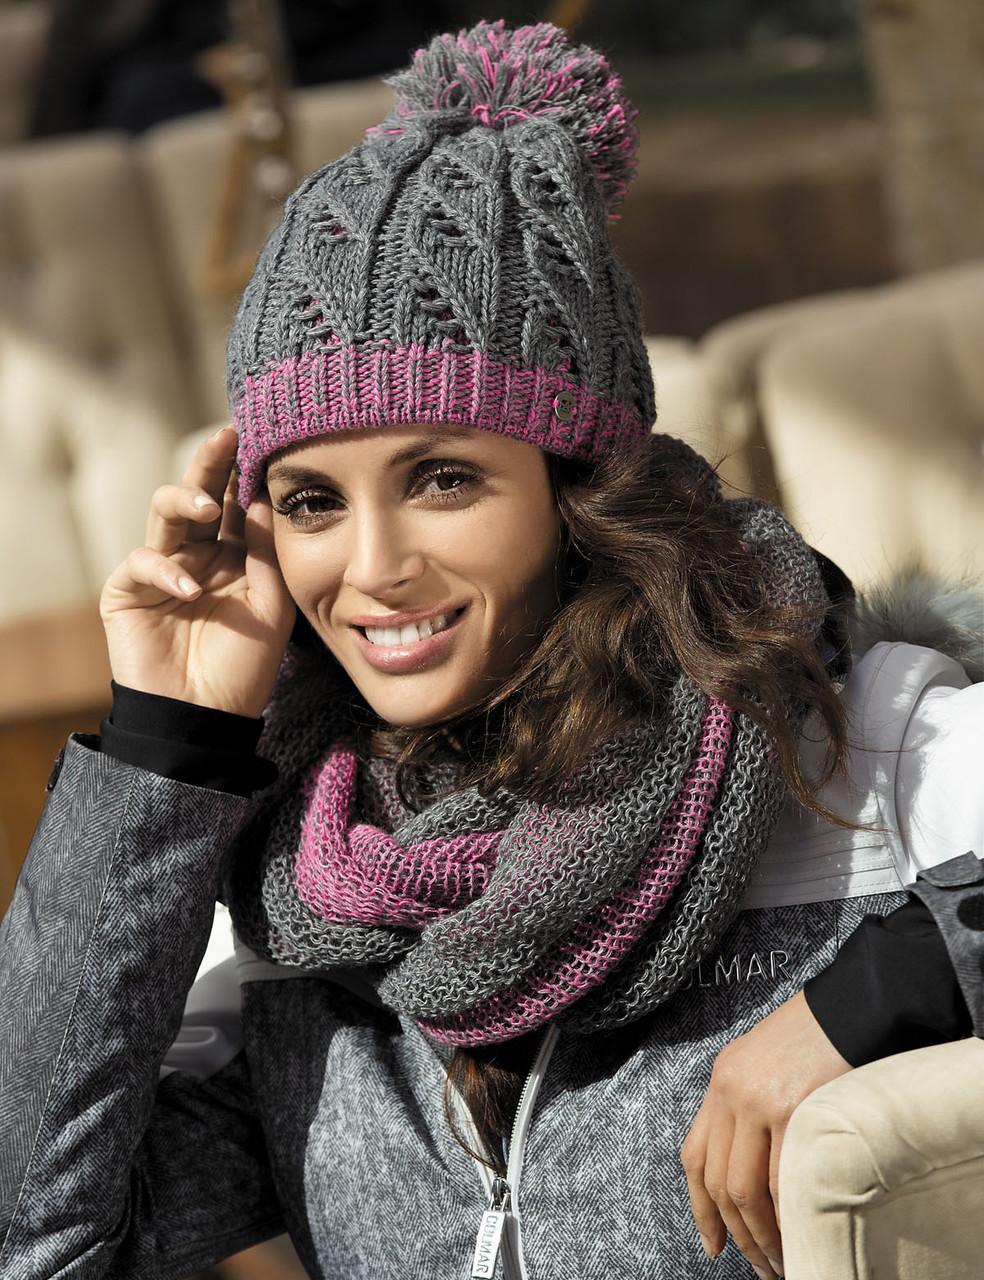 Гарна тепла ажурна шапка від Kamea - Catrina.